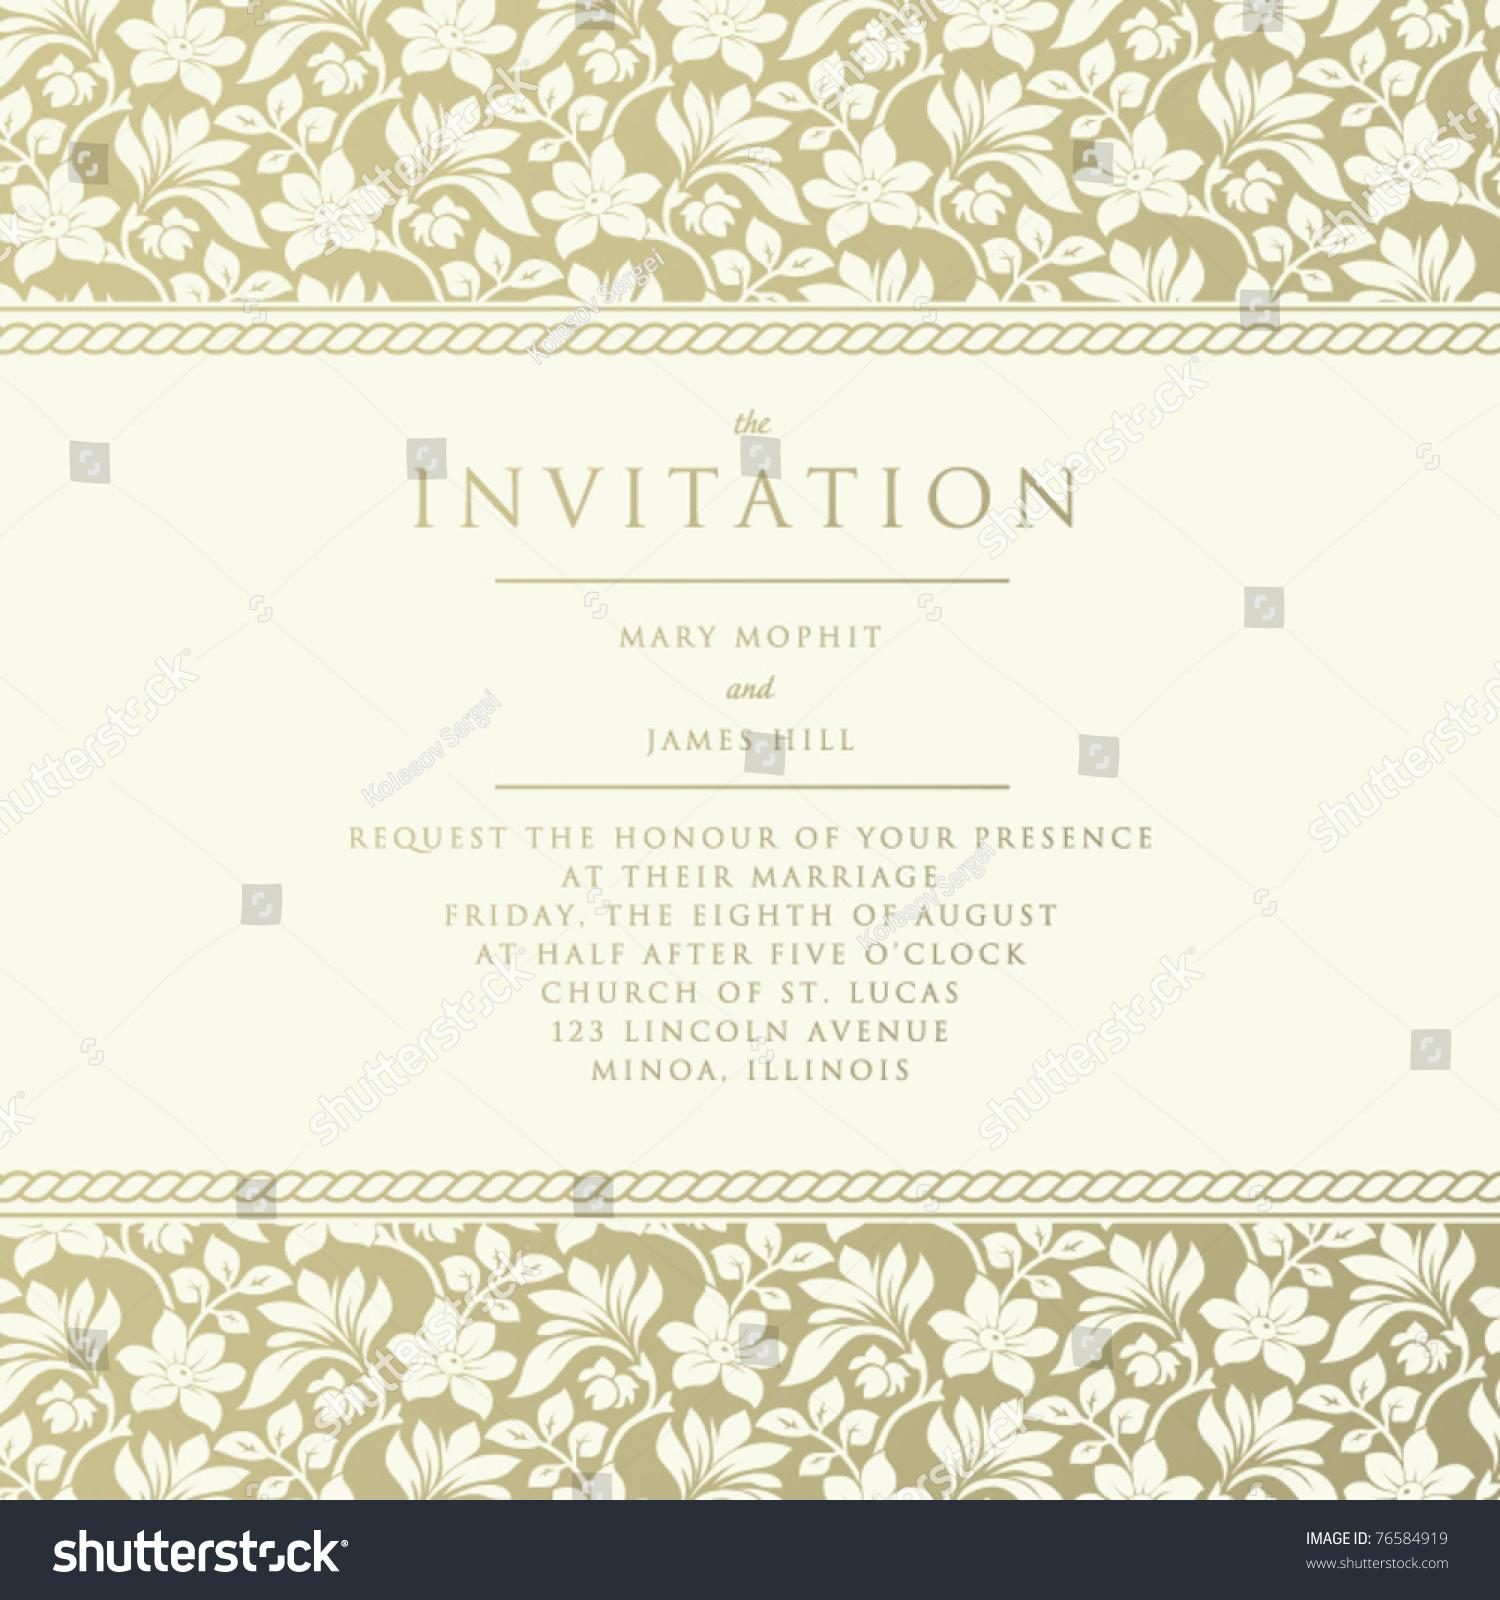 Wedding Altar Call: Ornate Damask Background. Invitation To The Wedding Or